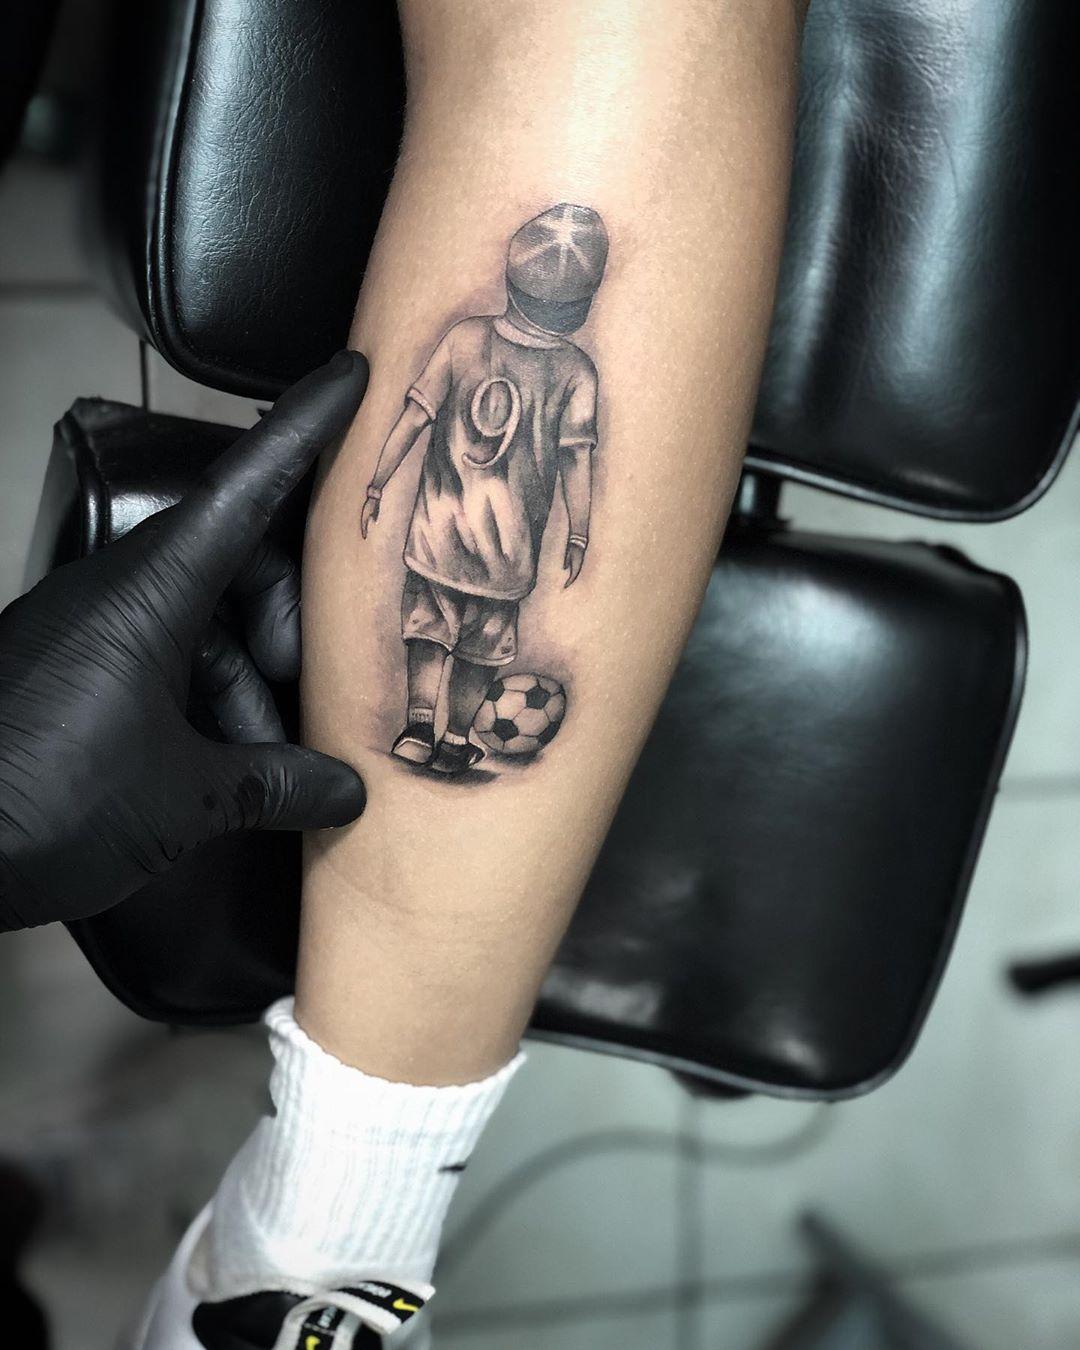 Татуировки в виде матери и ребёнка фото 17